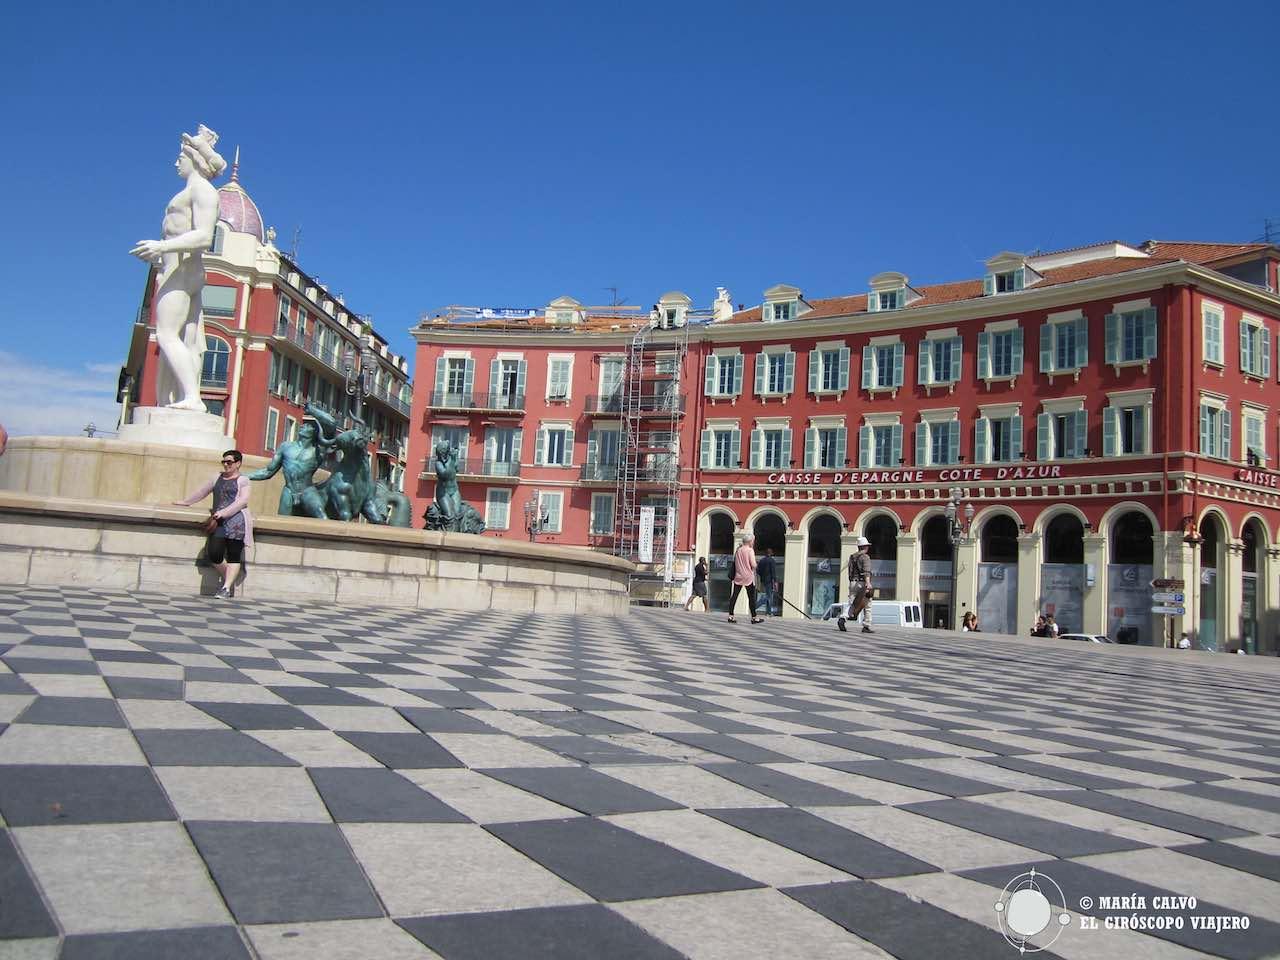 Los colores de la Plaza Masséna